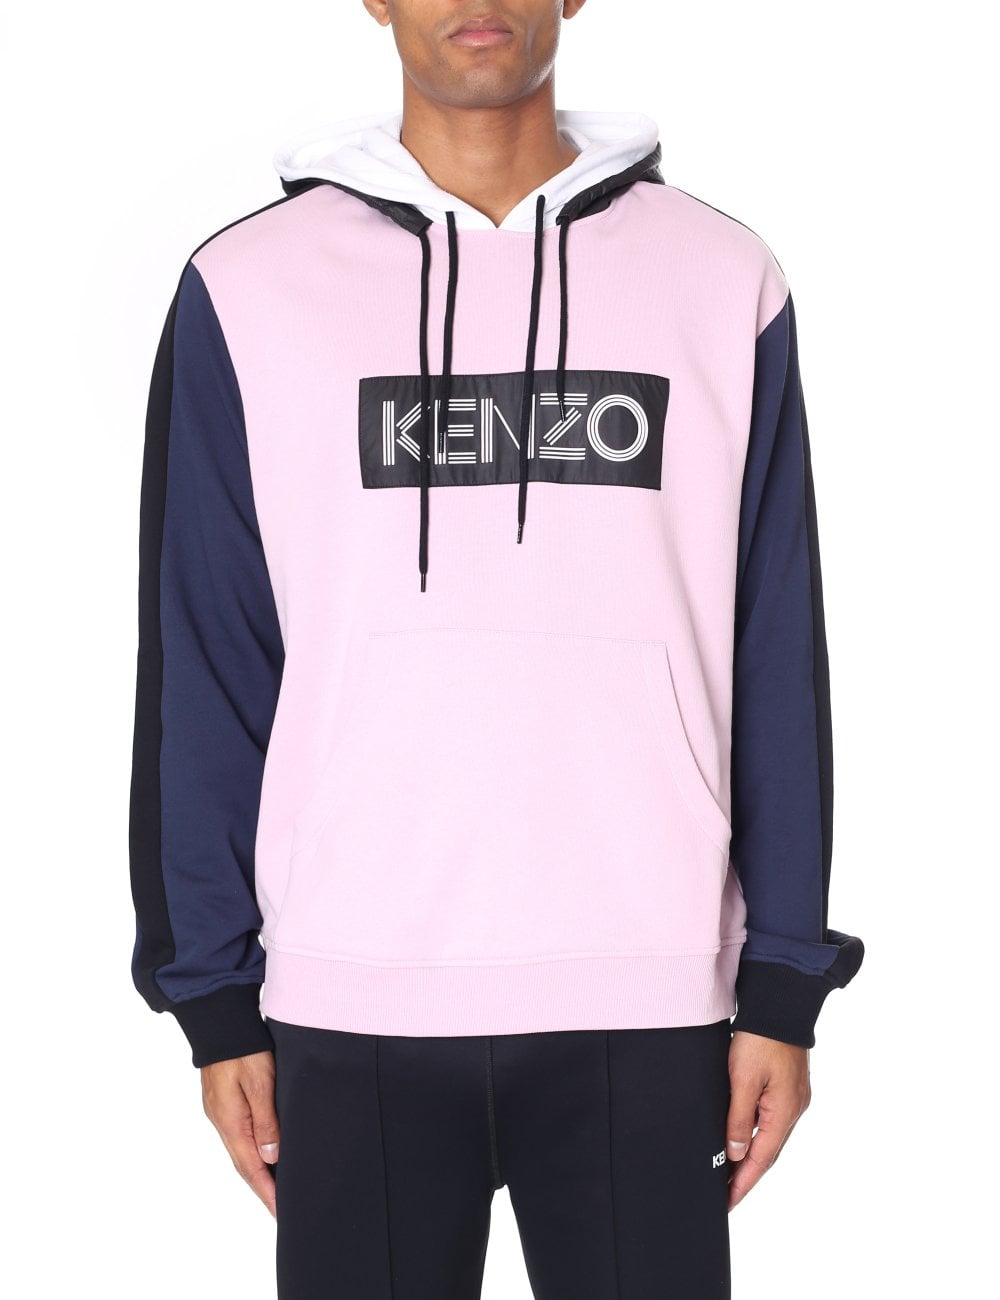 eaa16840 Men's Kenzo Logo Colour Block Sweatshirt